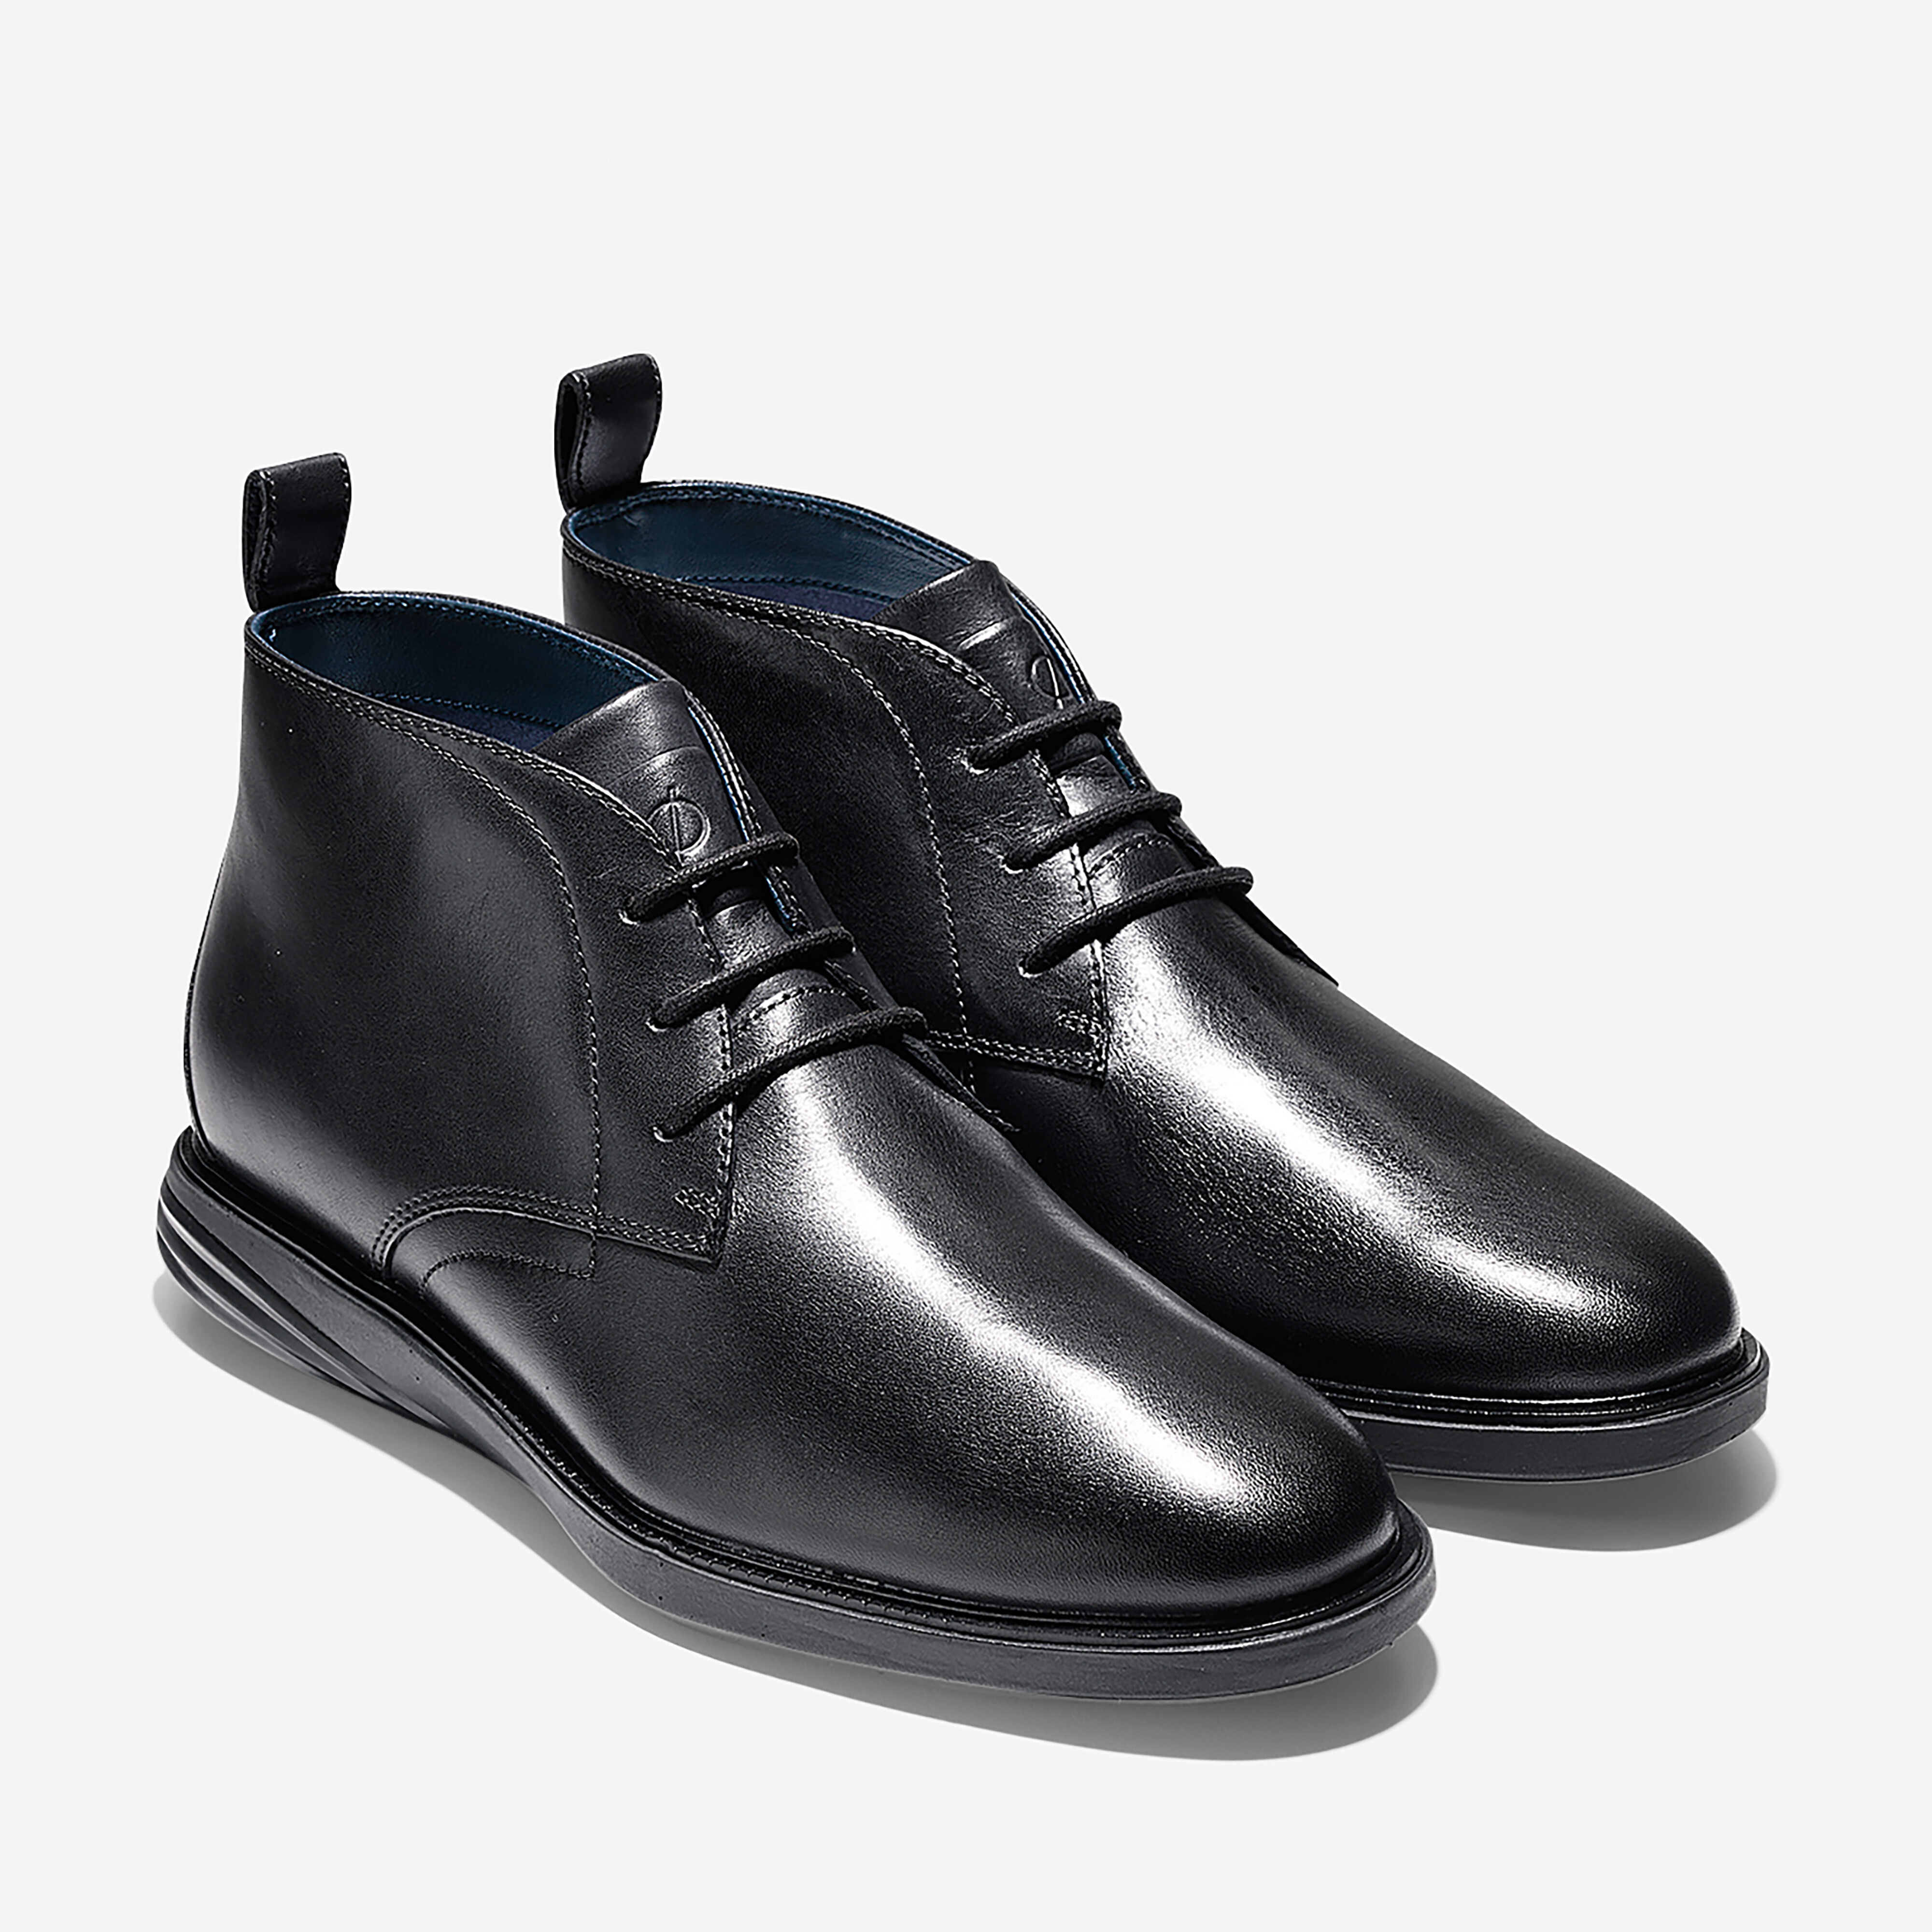 Men's Grand Evolution Chukka in Black